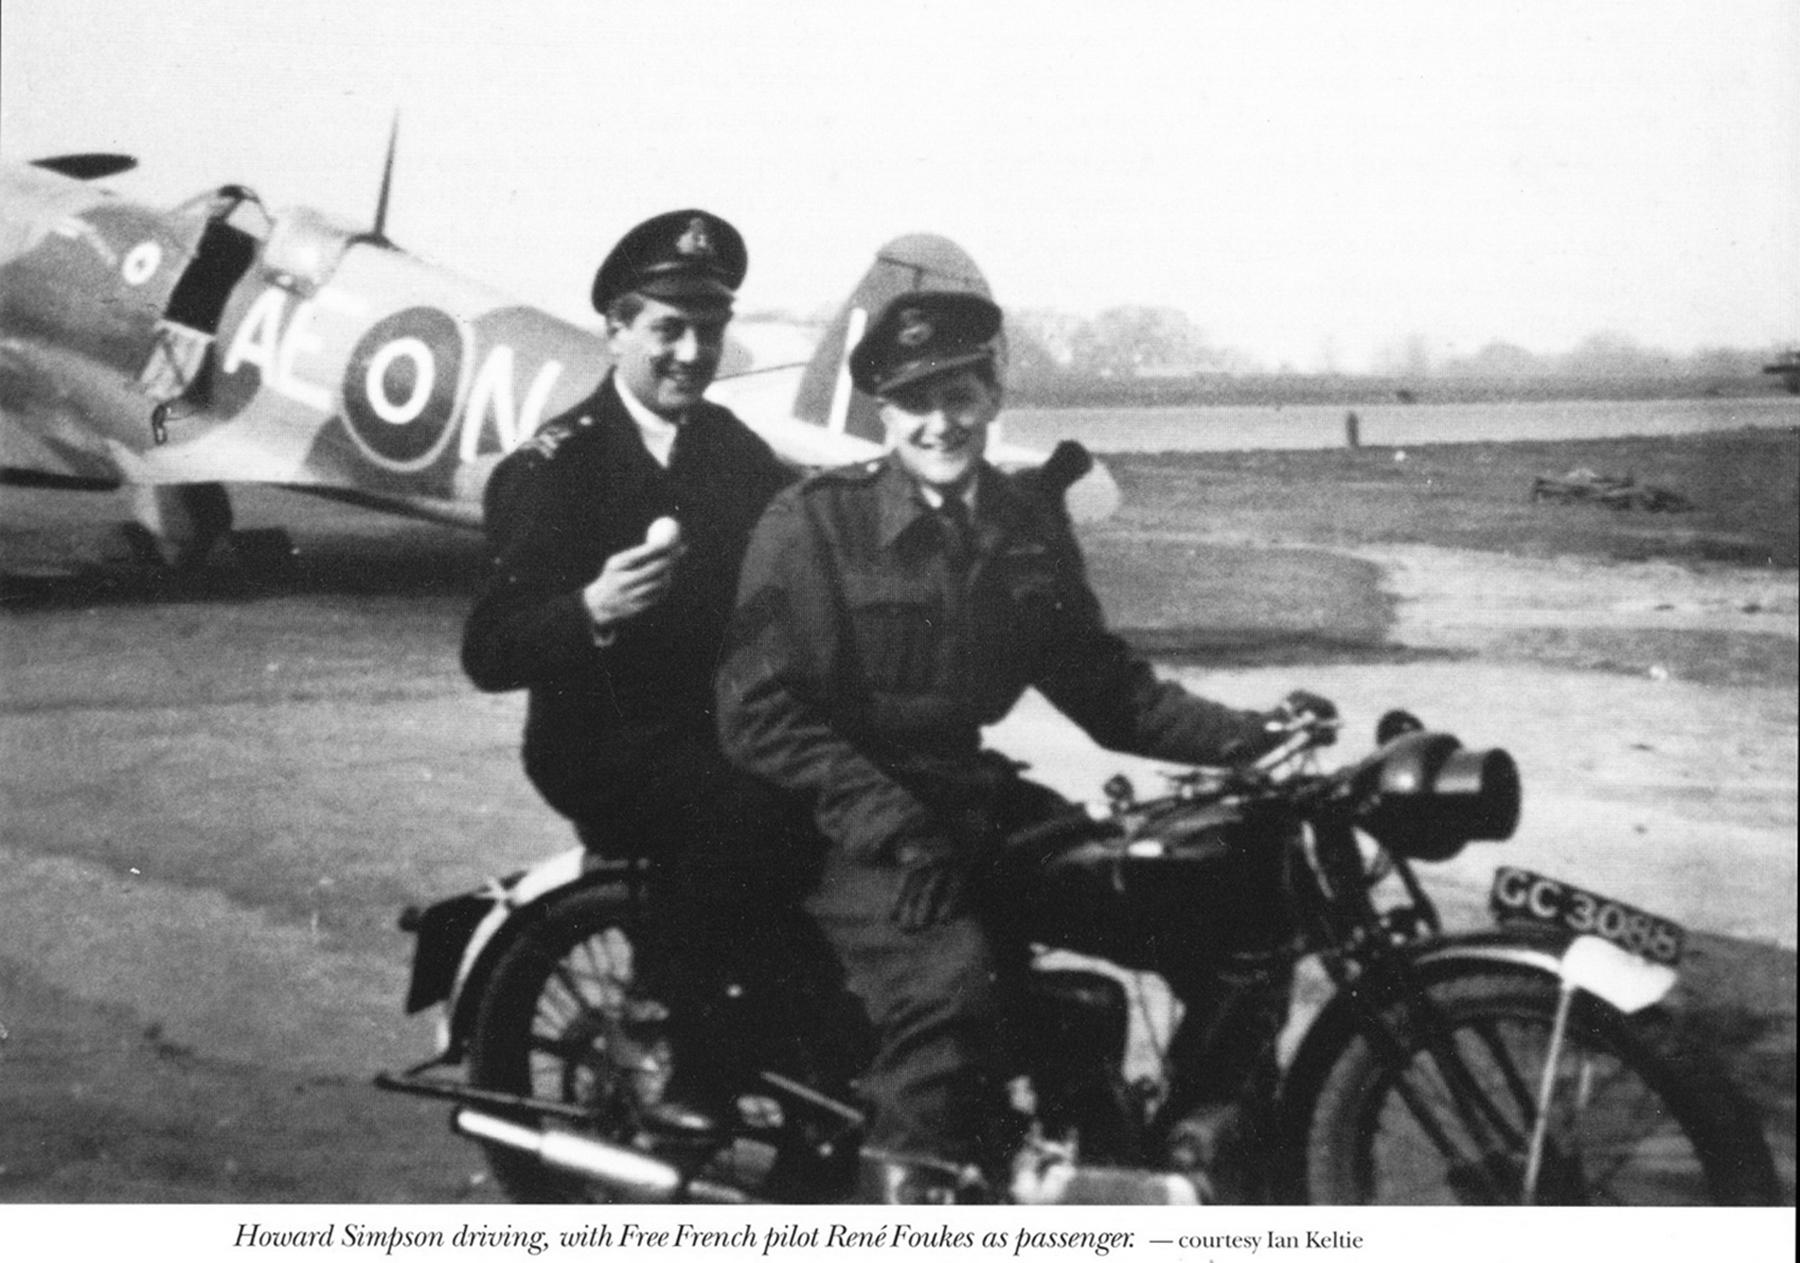 Spitfire MkIXc RCAF 402Sqn AEN BS430 background 1942 01